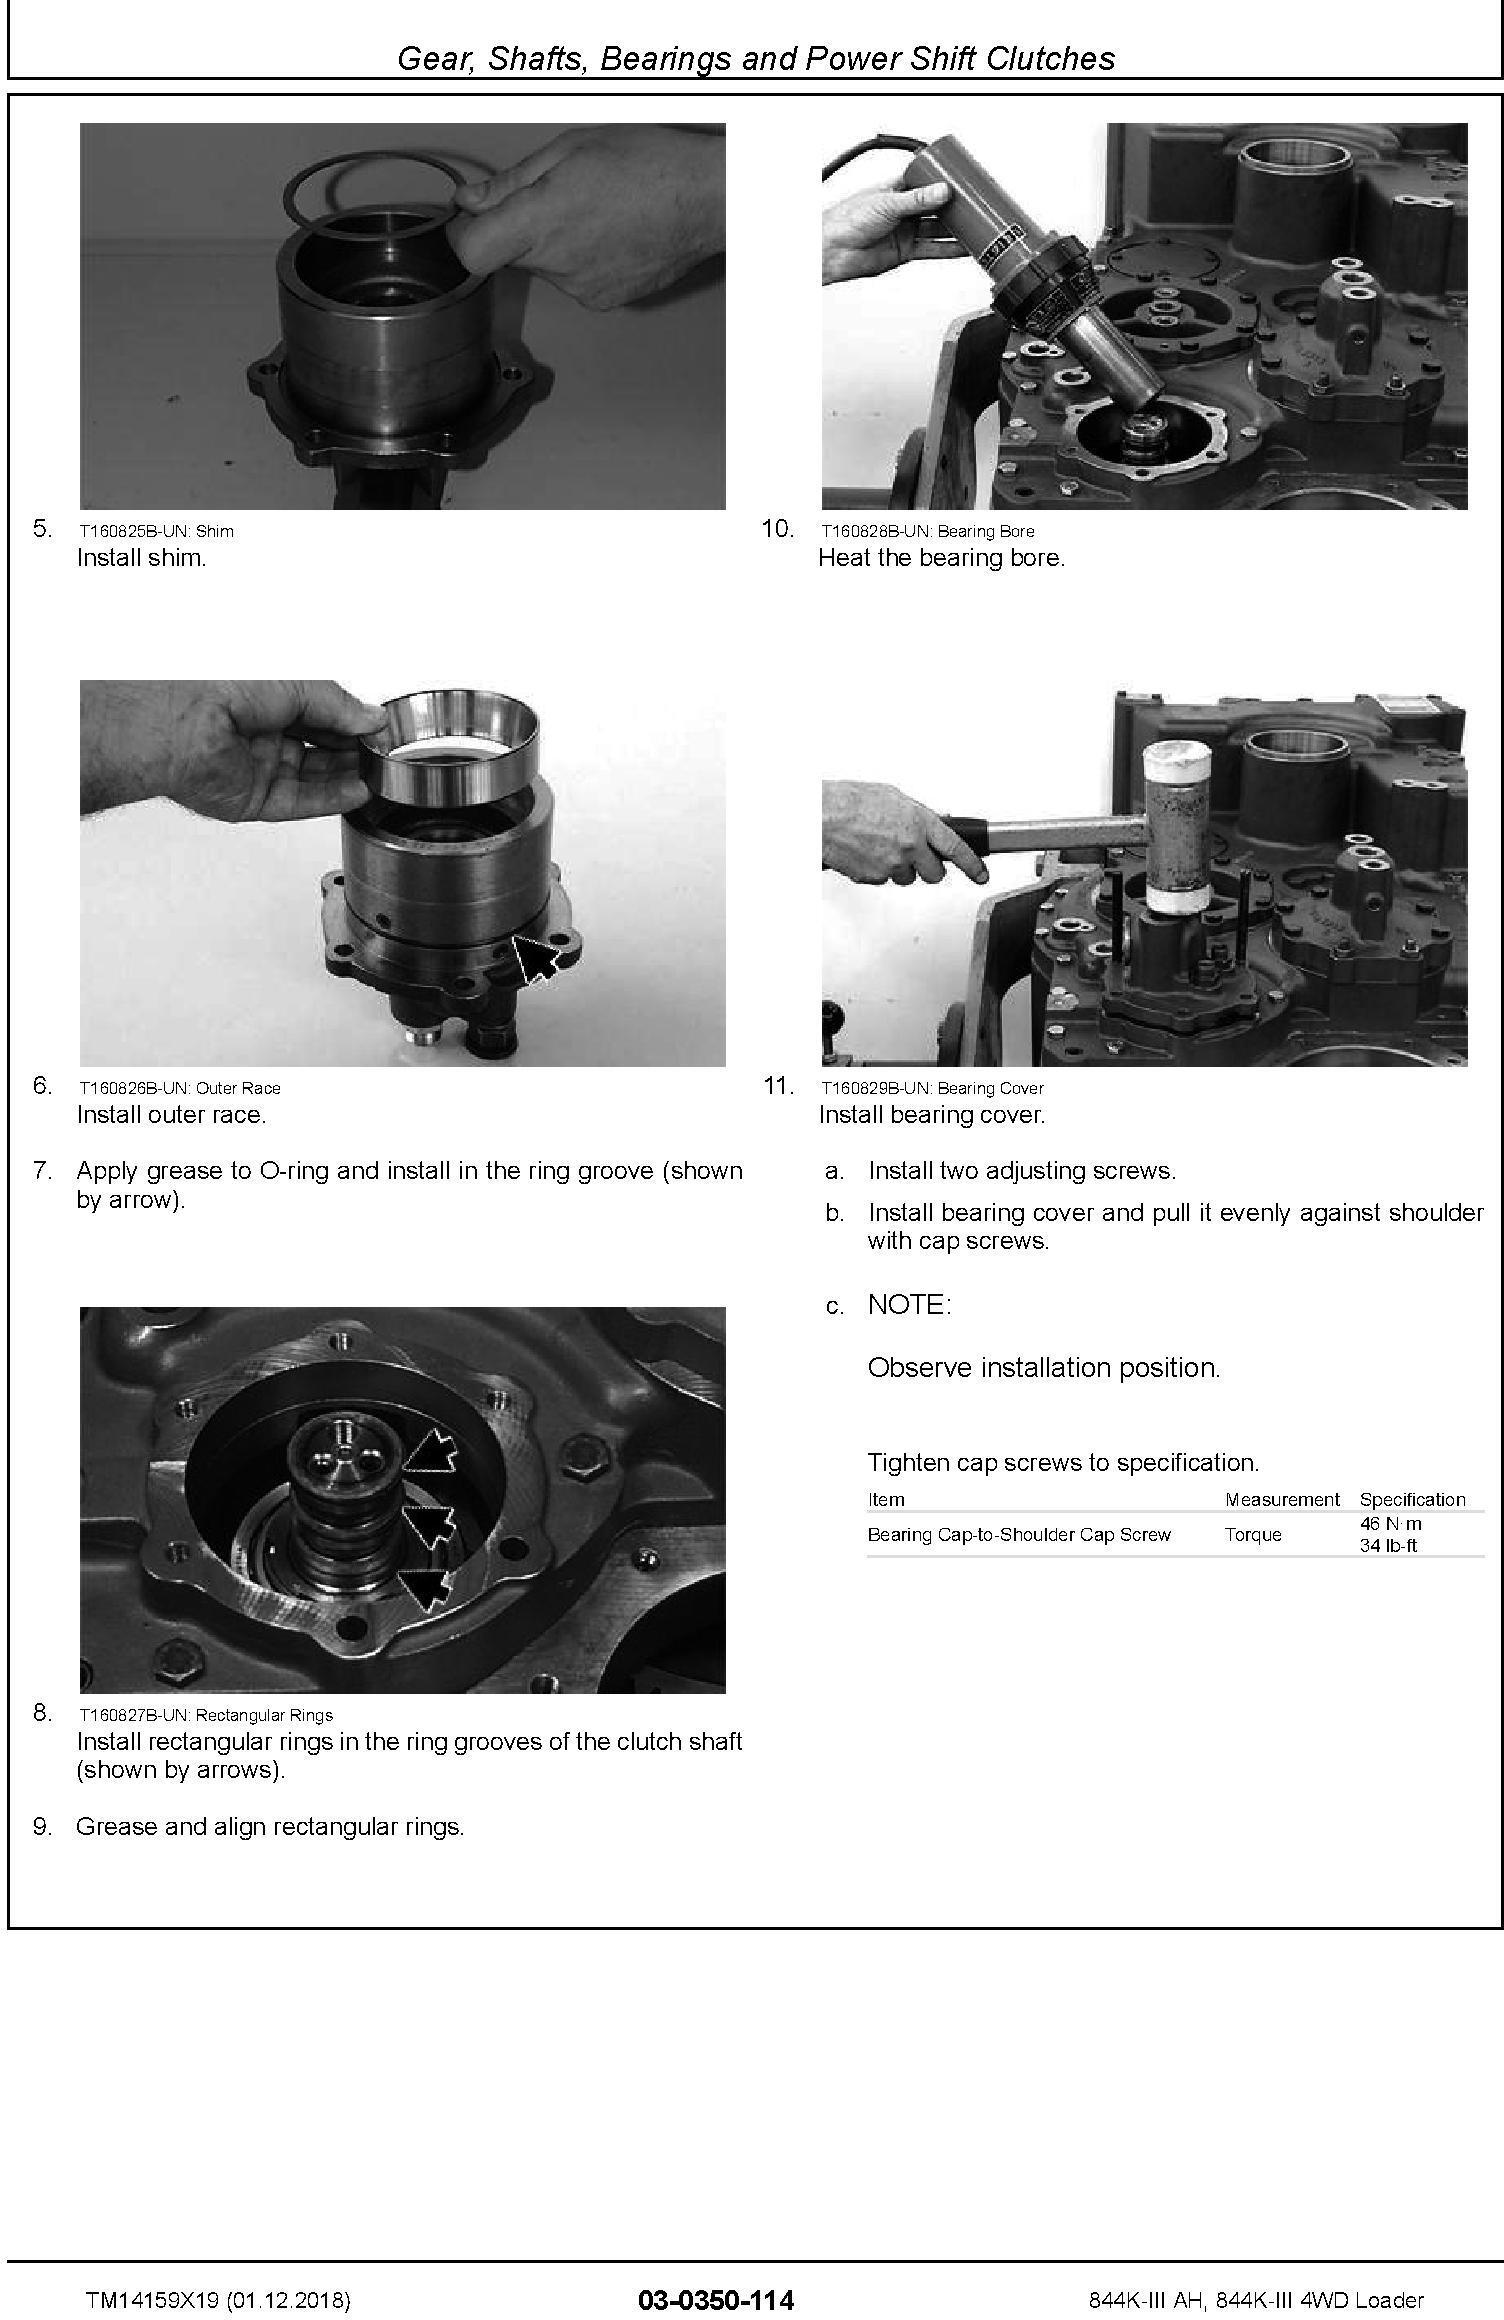 John Deere 844K-III (AH) SN. from F677782 4WD Loader Repair Technical Service Manual (TM14159X19) - 1